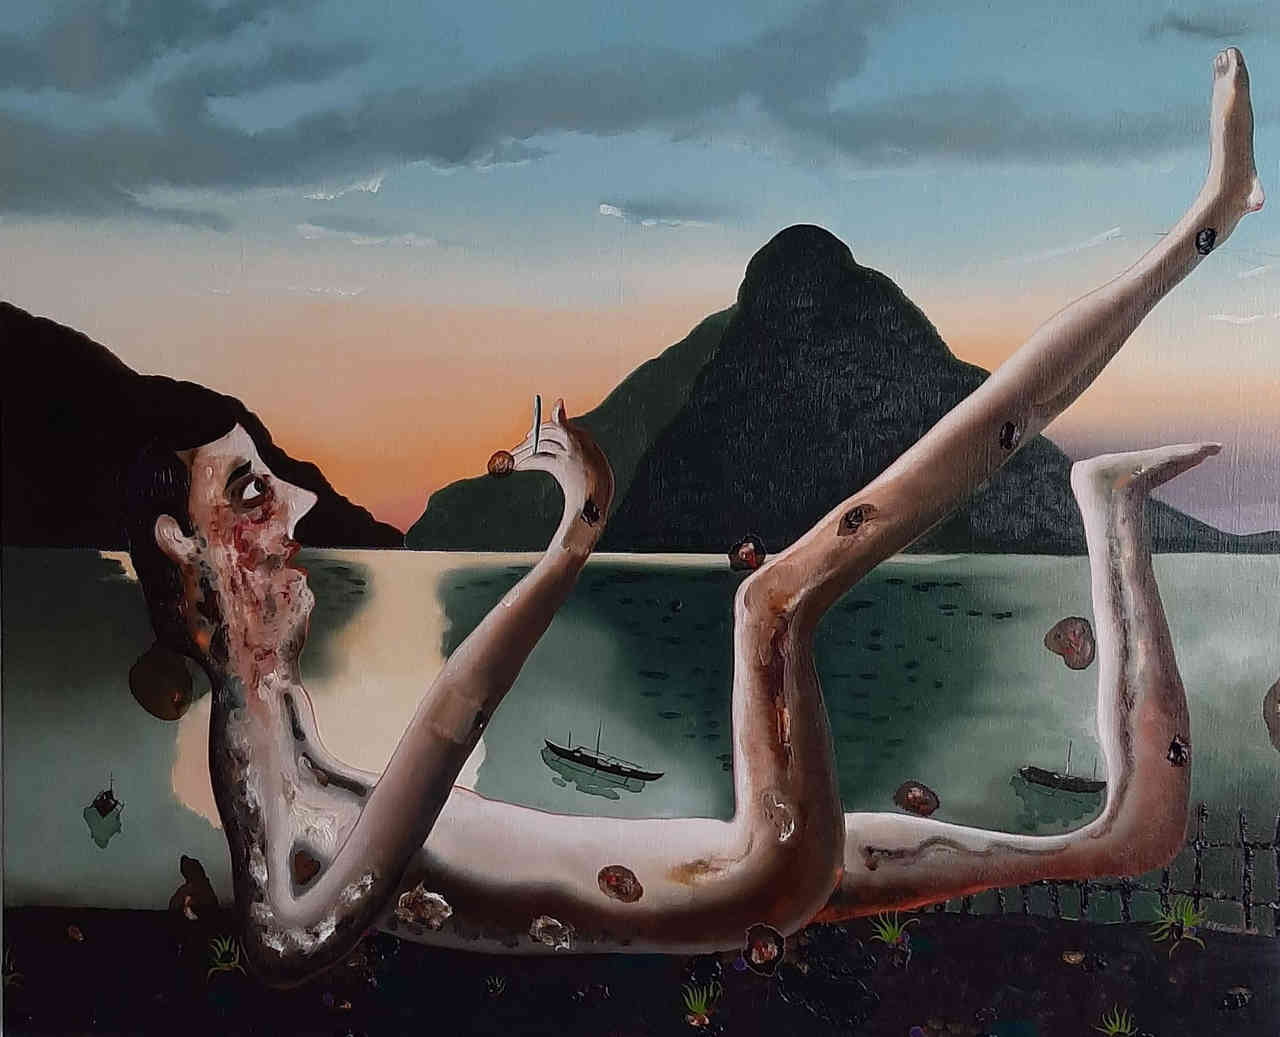 Vangelis Pliarides, El Nido, 90 x 110 cm, oil on linen, 2019